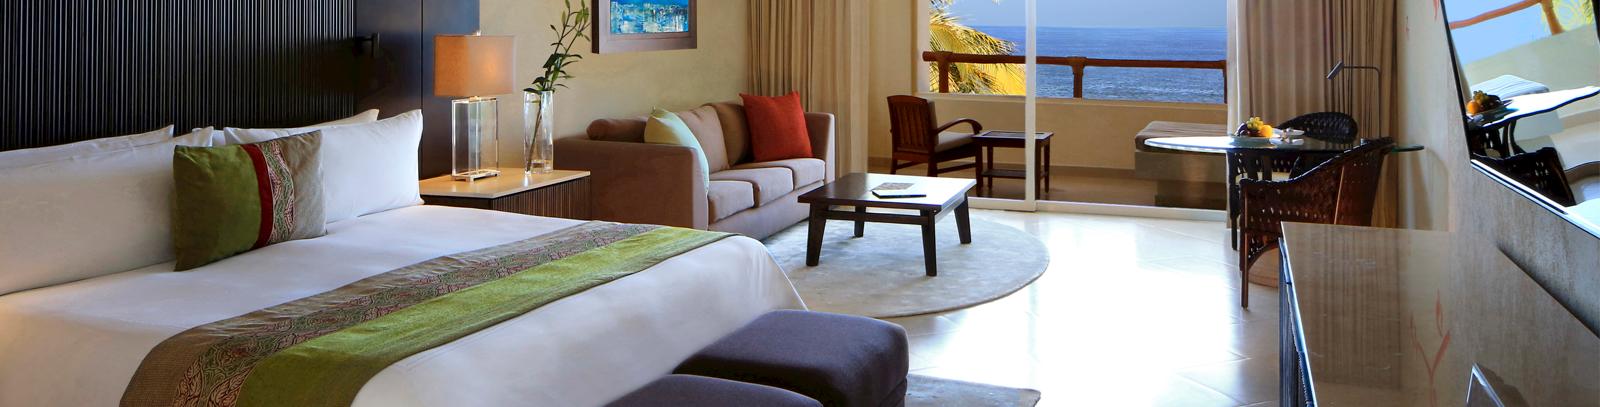 Grand Velas Riviera Nayarit offering Parlor Suite